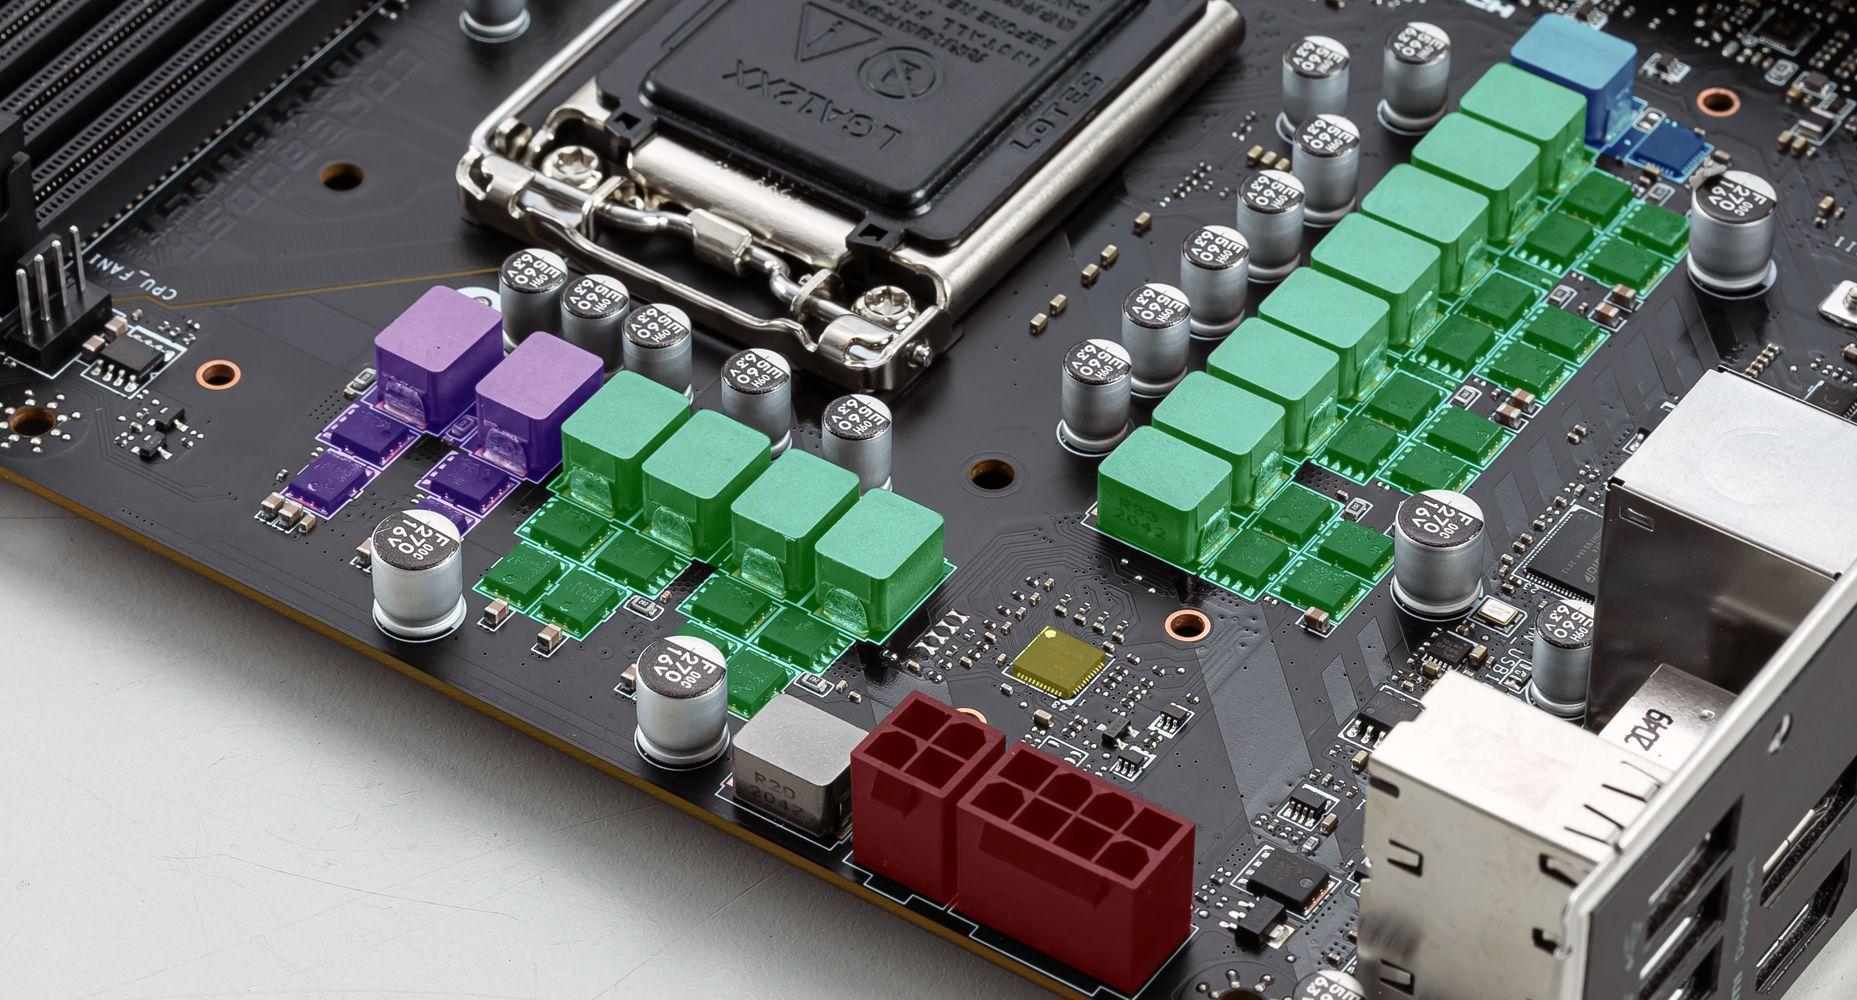 MSI MAG B560 TOMAHAWK WIFI DUET RAIL POWER SYSTEM